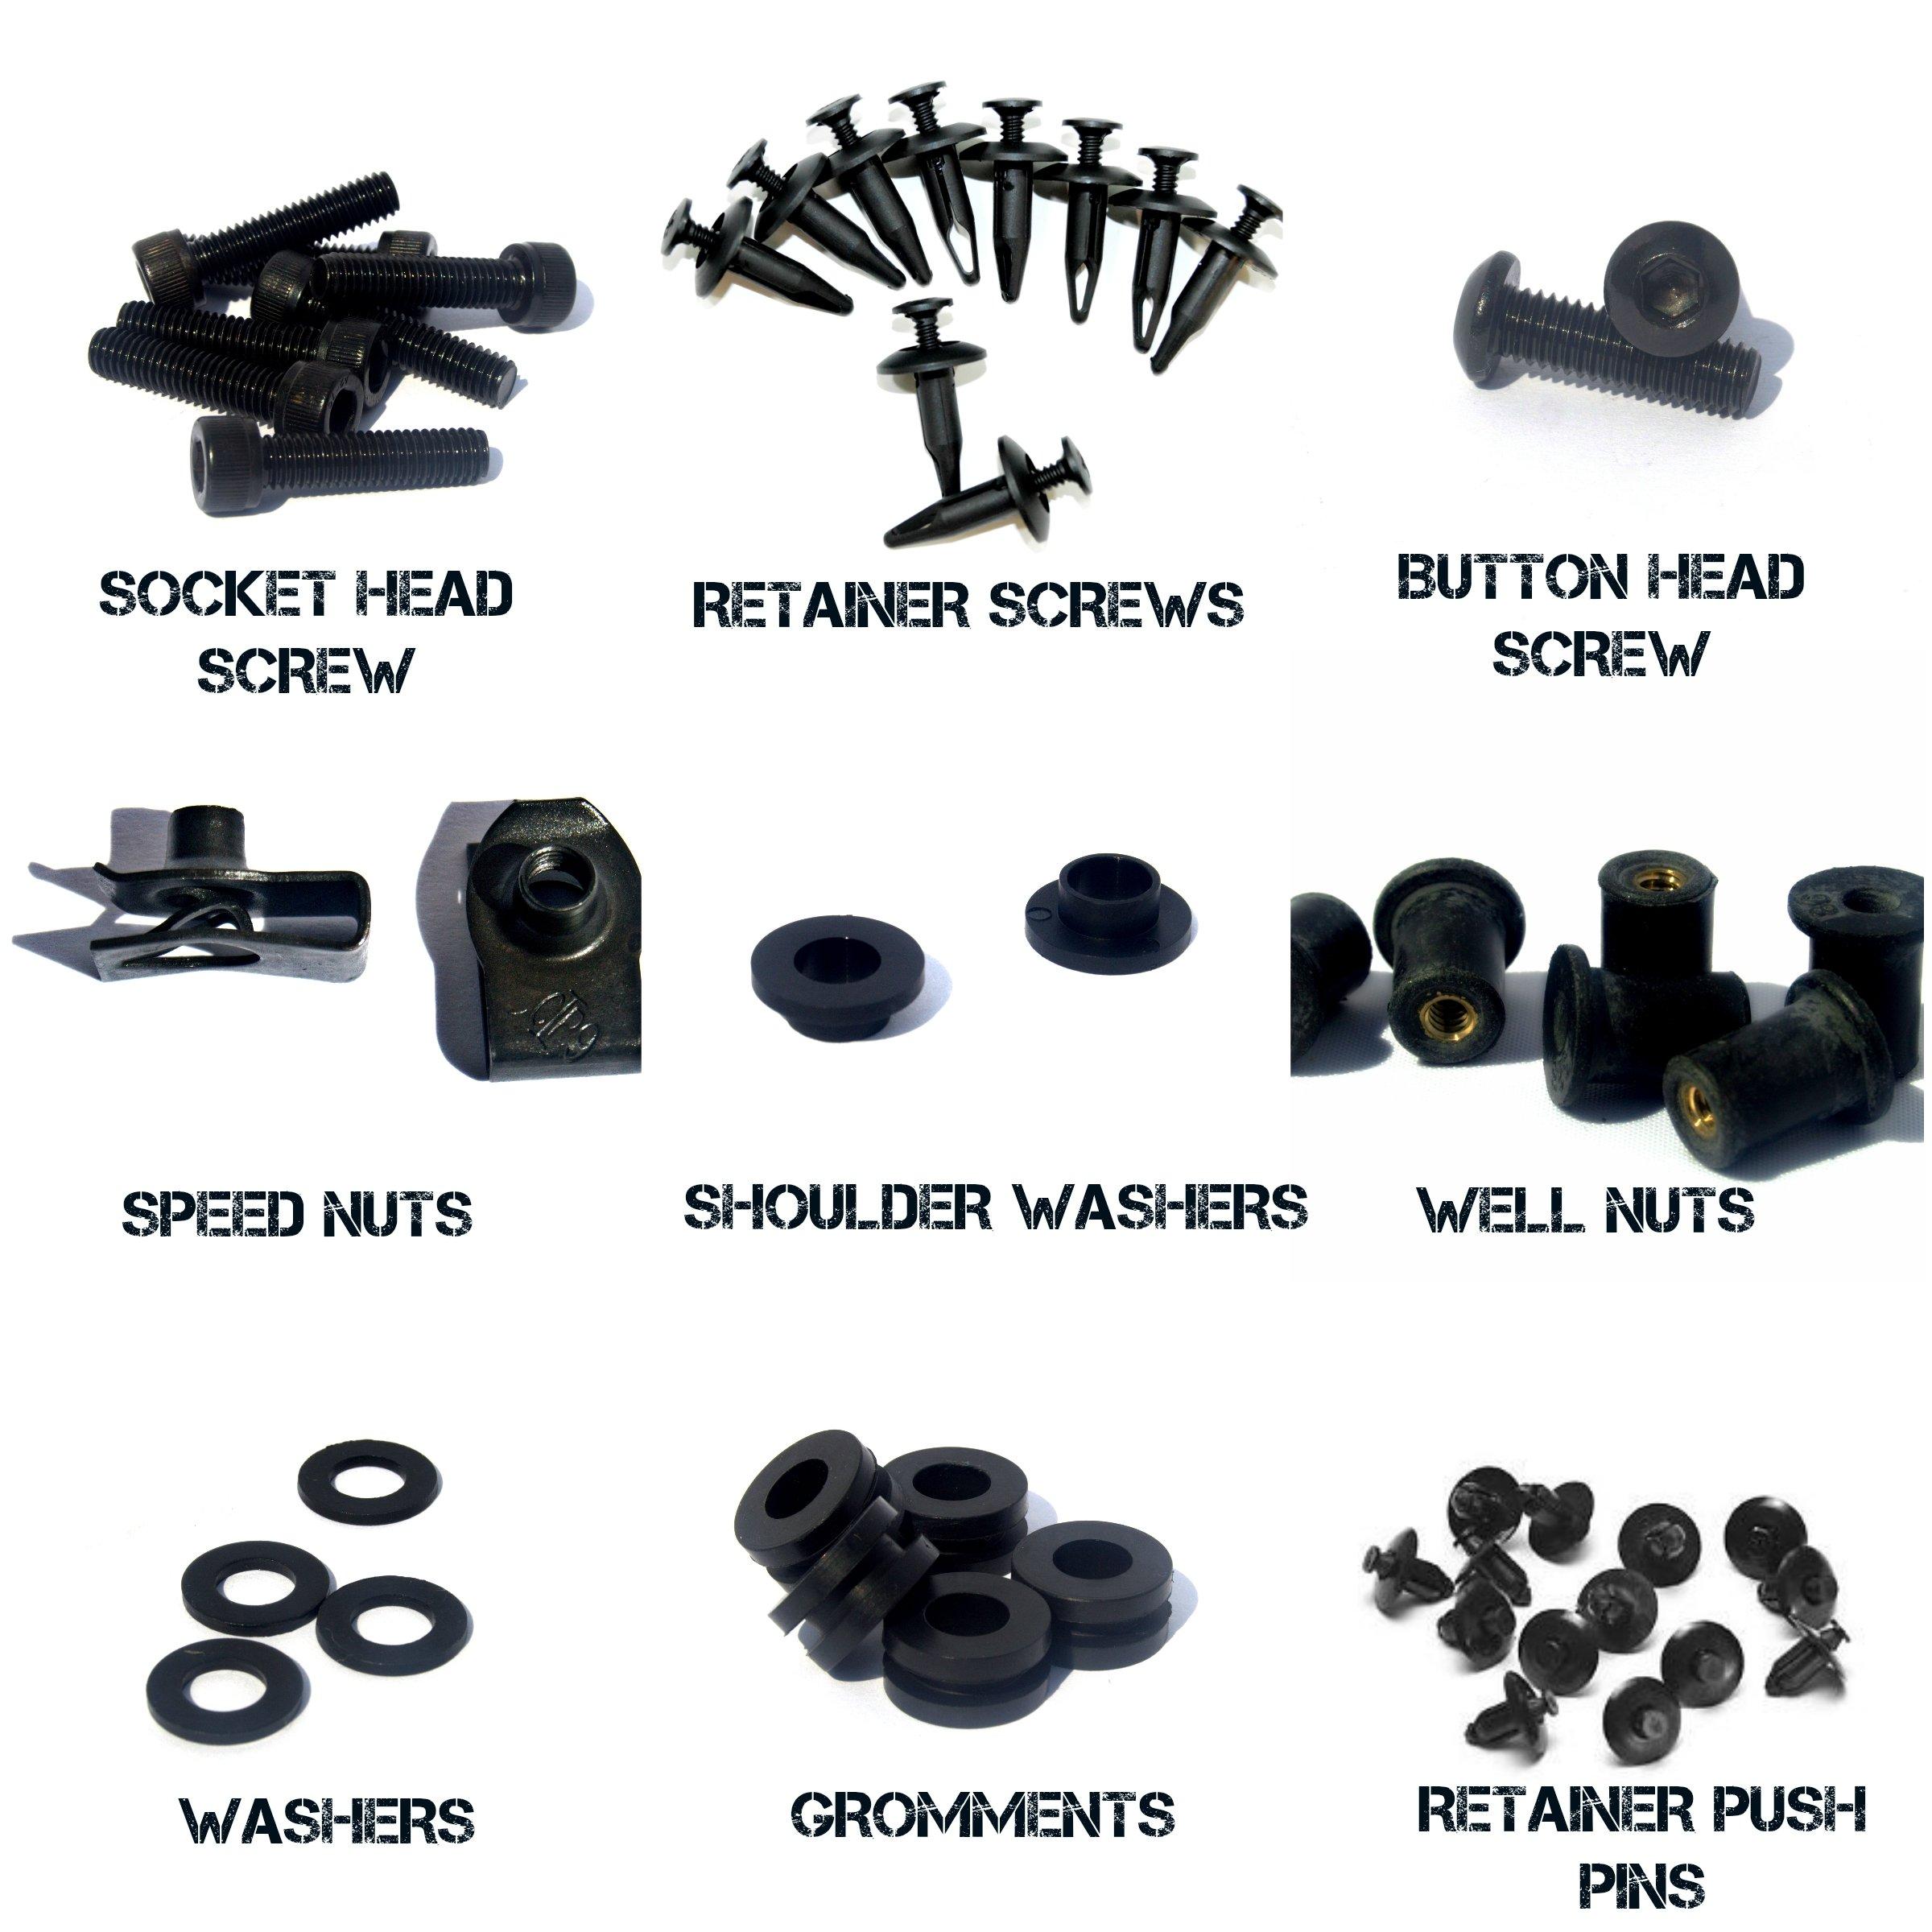 Black Complete Motorcycle Fairing Bolt Kit Honda CBR600RR 2003 - 2004 Body Screws, Fasteners, and Hardware by Bike Boltz (Image #4)